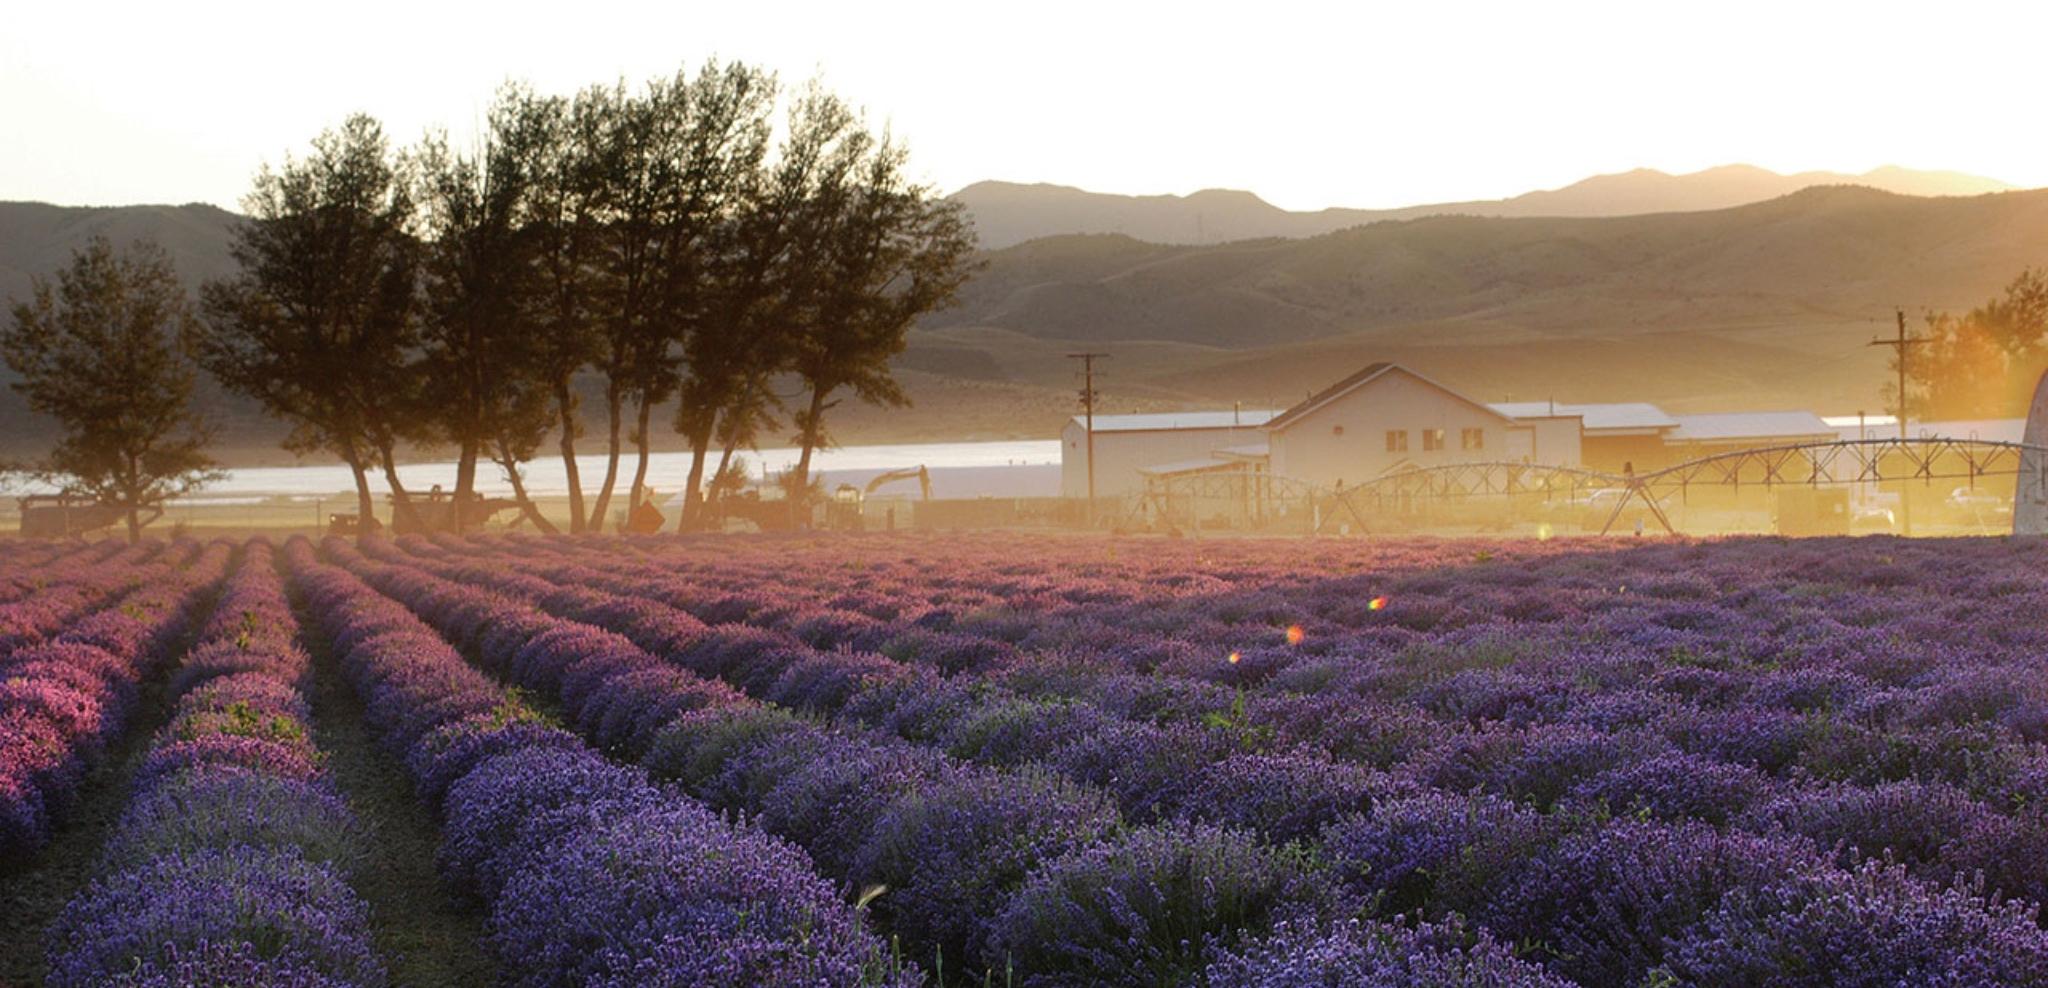 Lavender Fields prior to harvest